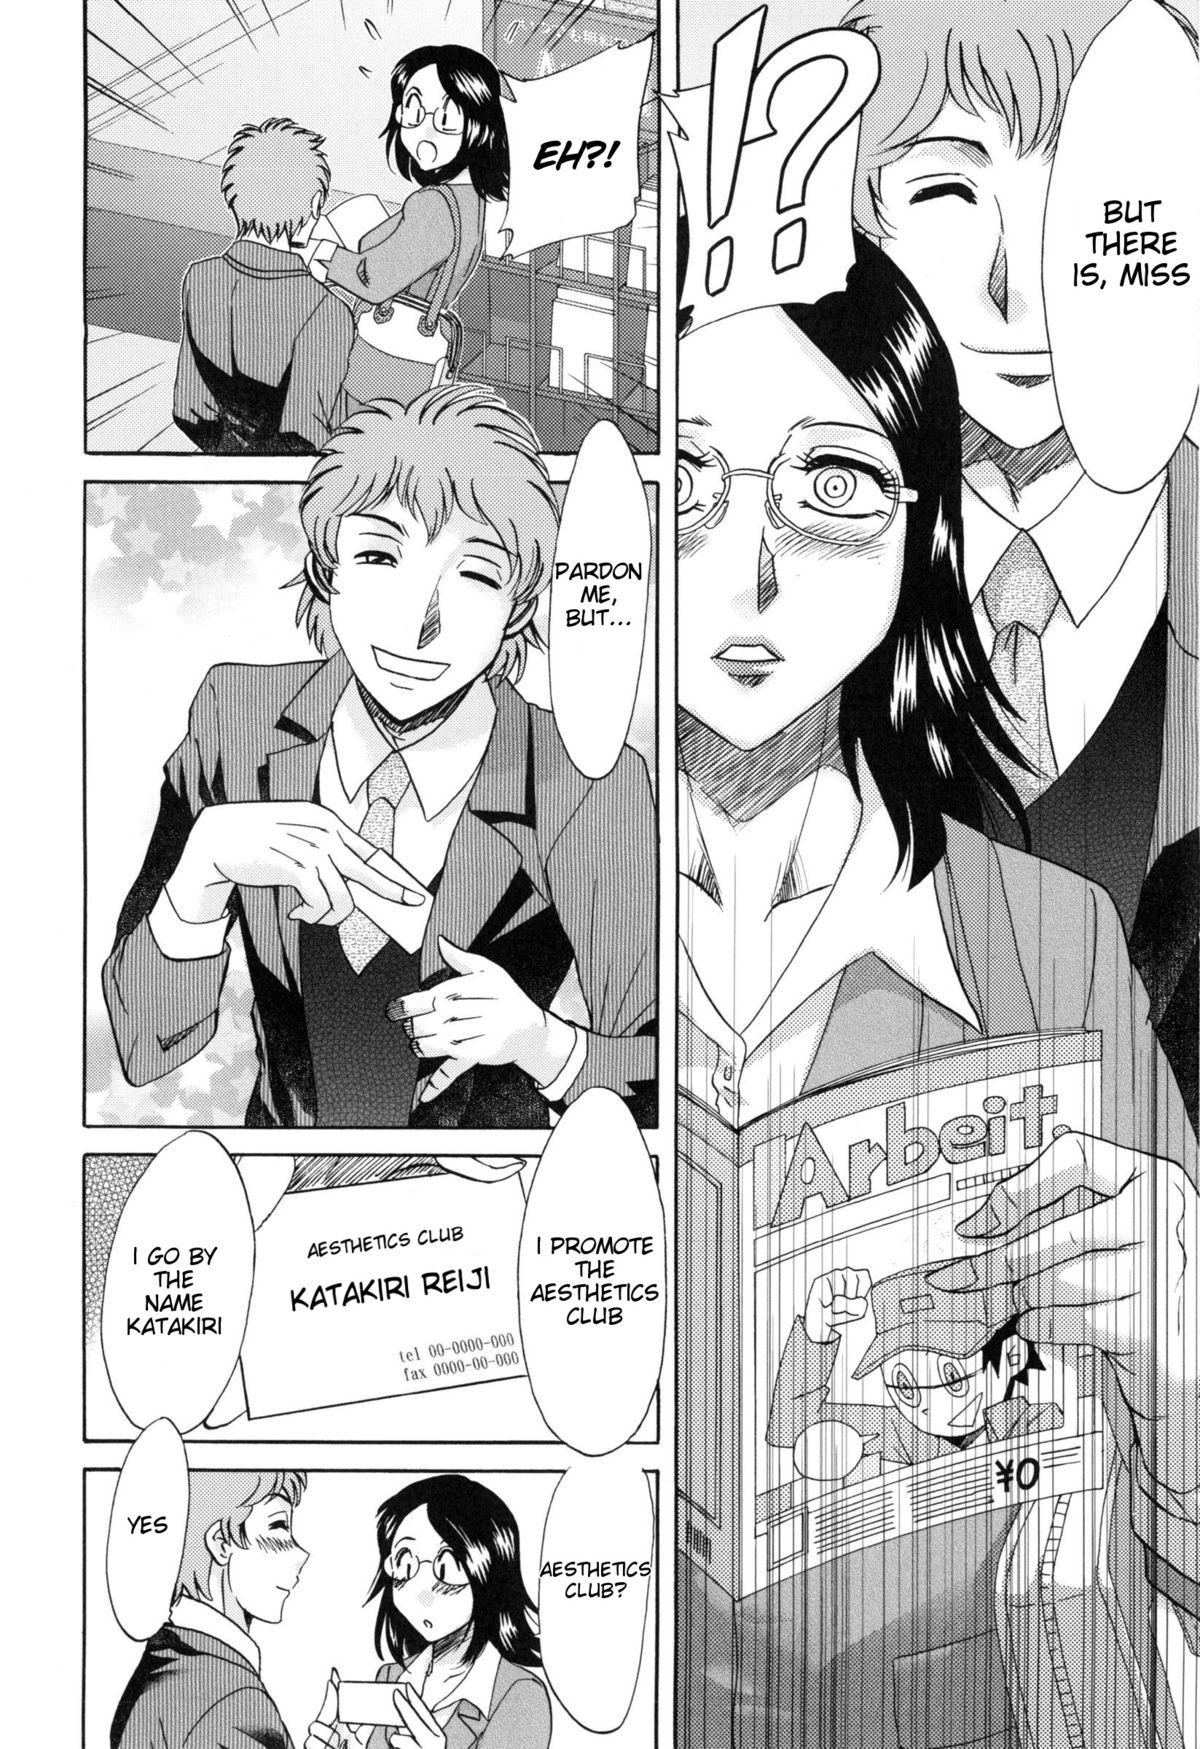 Hentai Kansoku | Pervertspotting 9